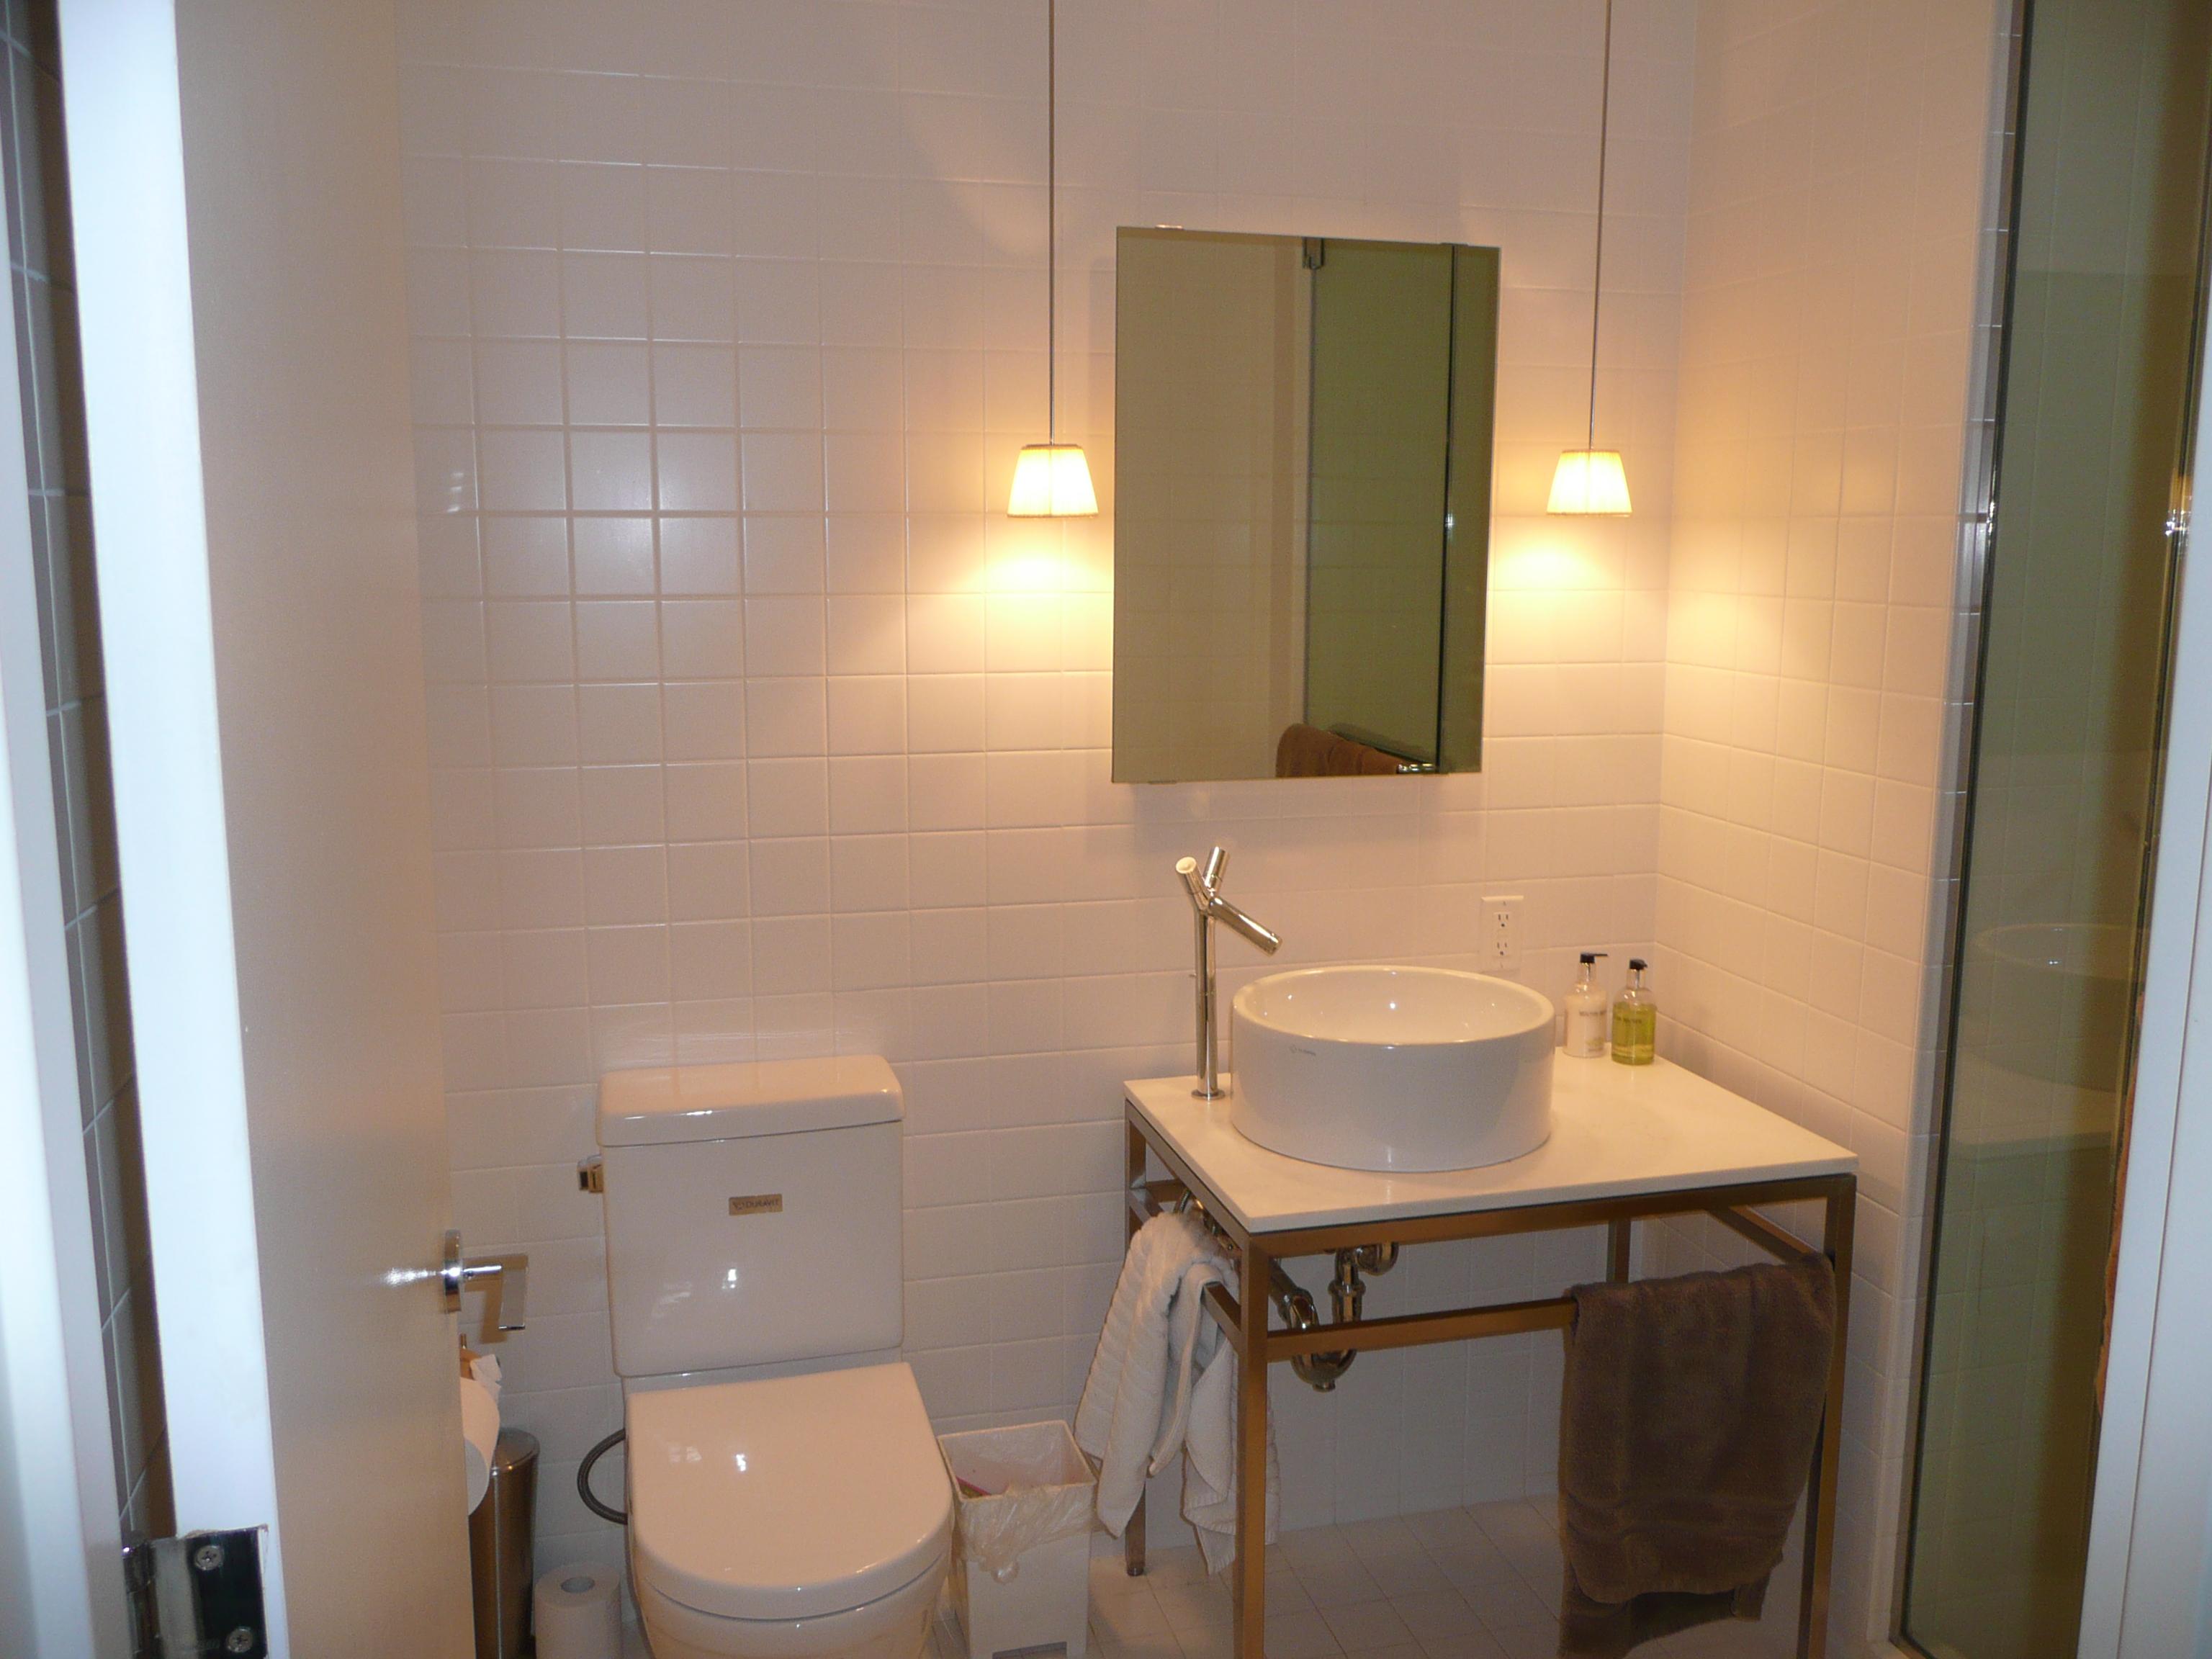 Custom Bathroom Vanities New York custom bathroom vanities, medicine cabinets & chests, furniture